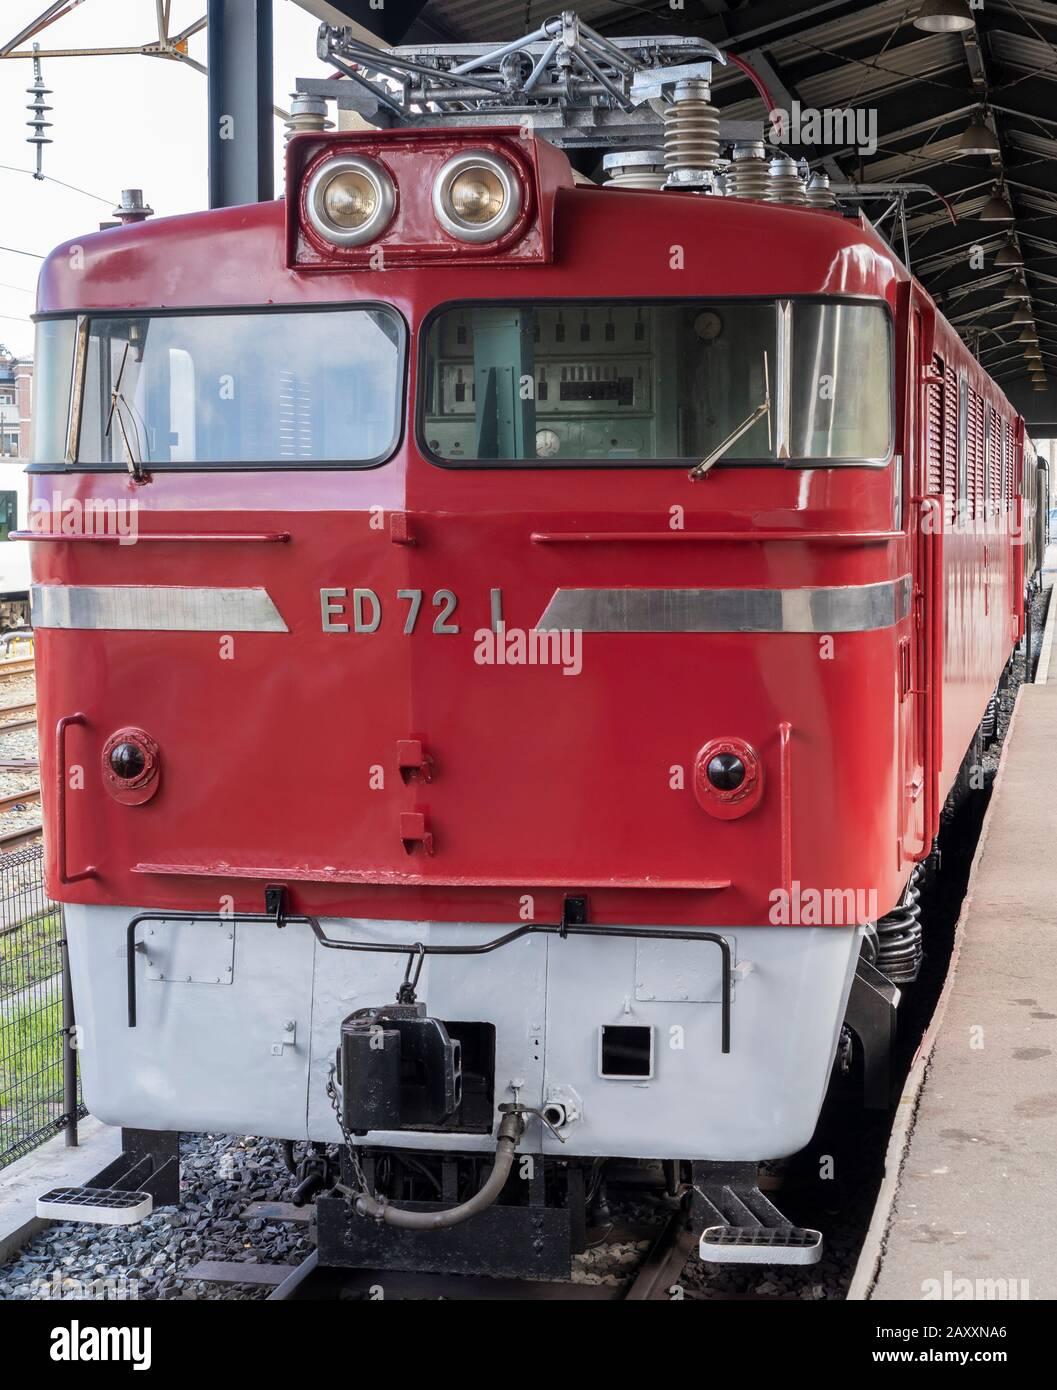 An ED72 Series electric locomotive at the Kyushu Railway History Museum in Kitakyushu, Japan. Stock Photo